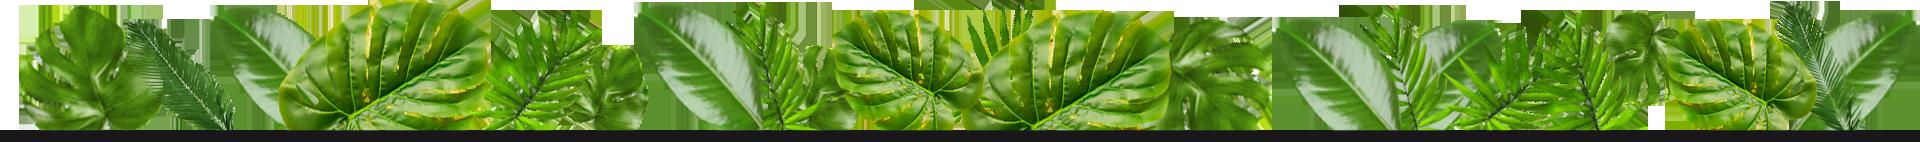 banda-hojas